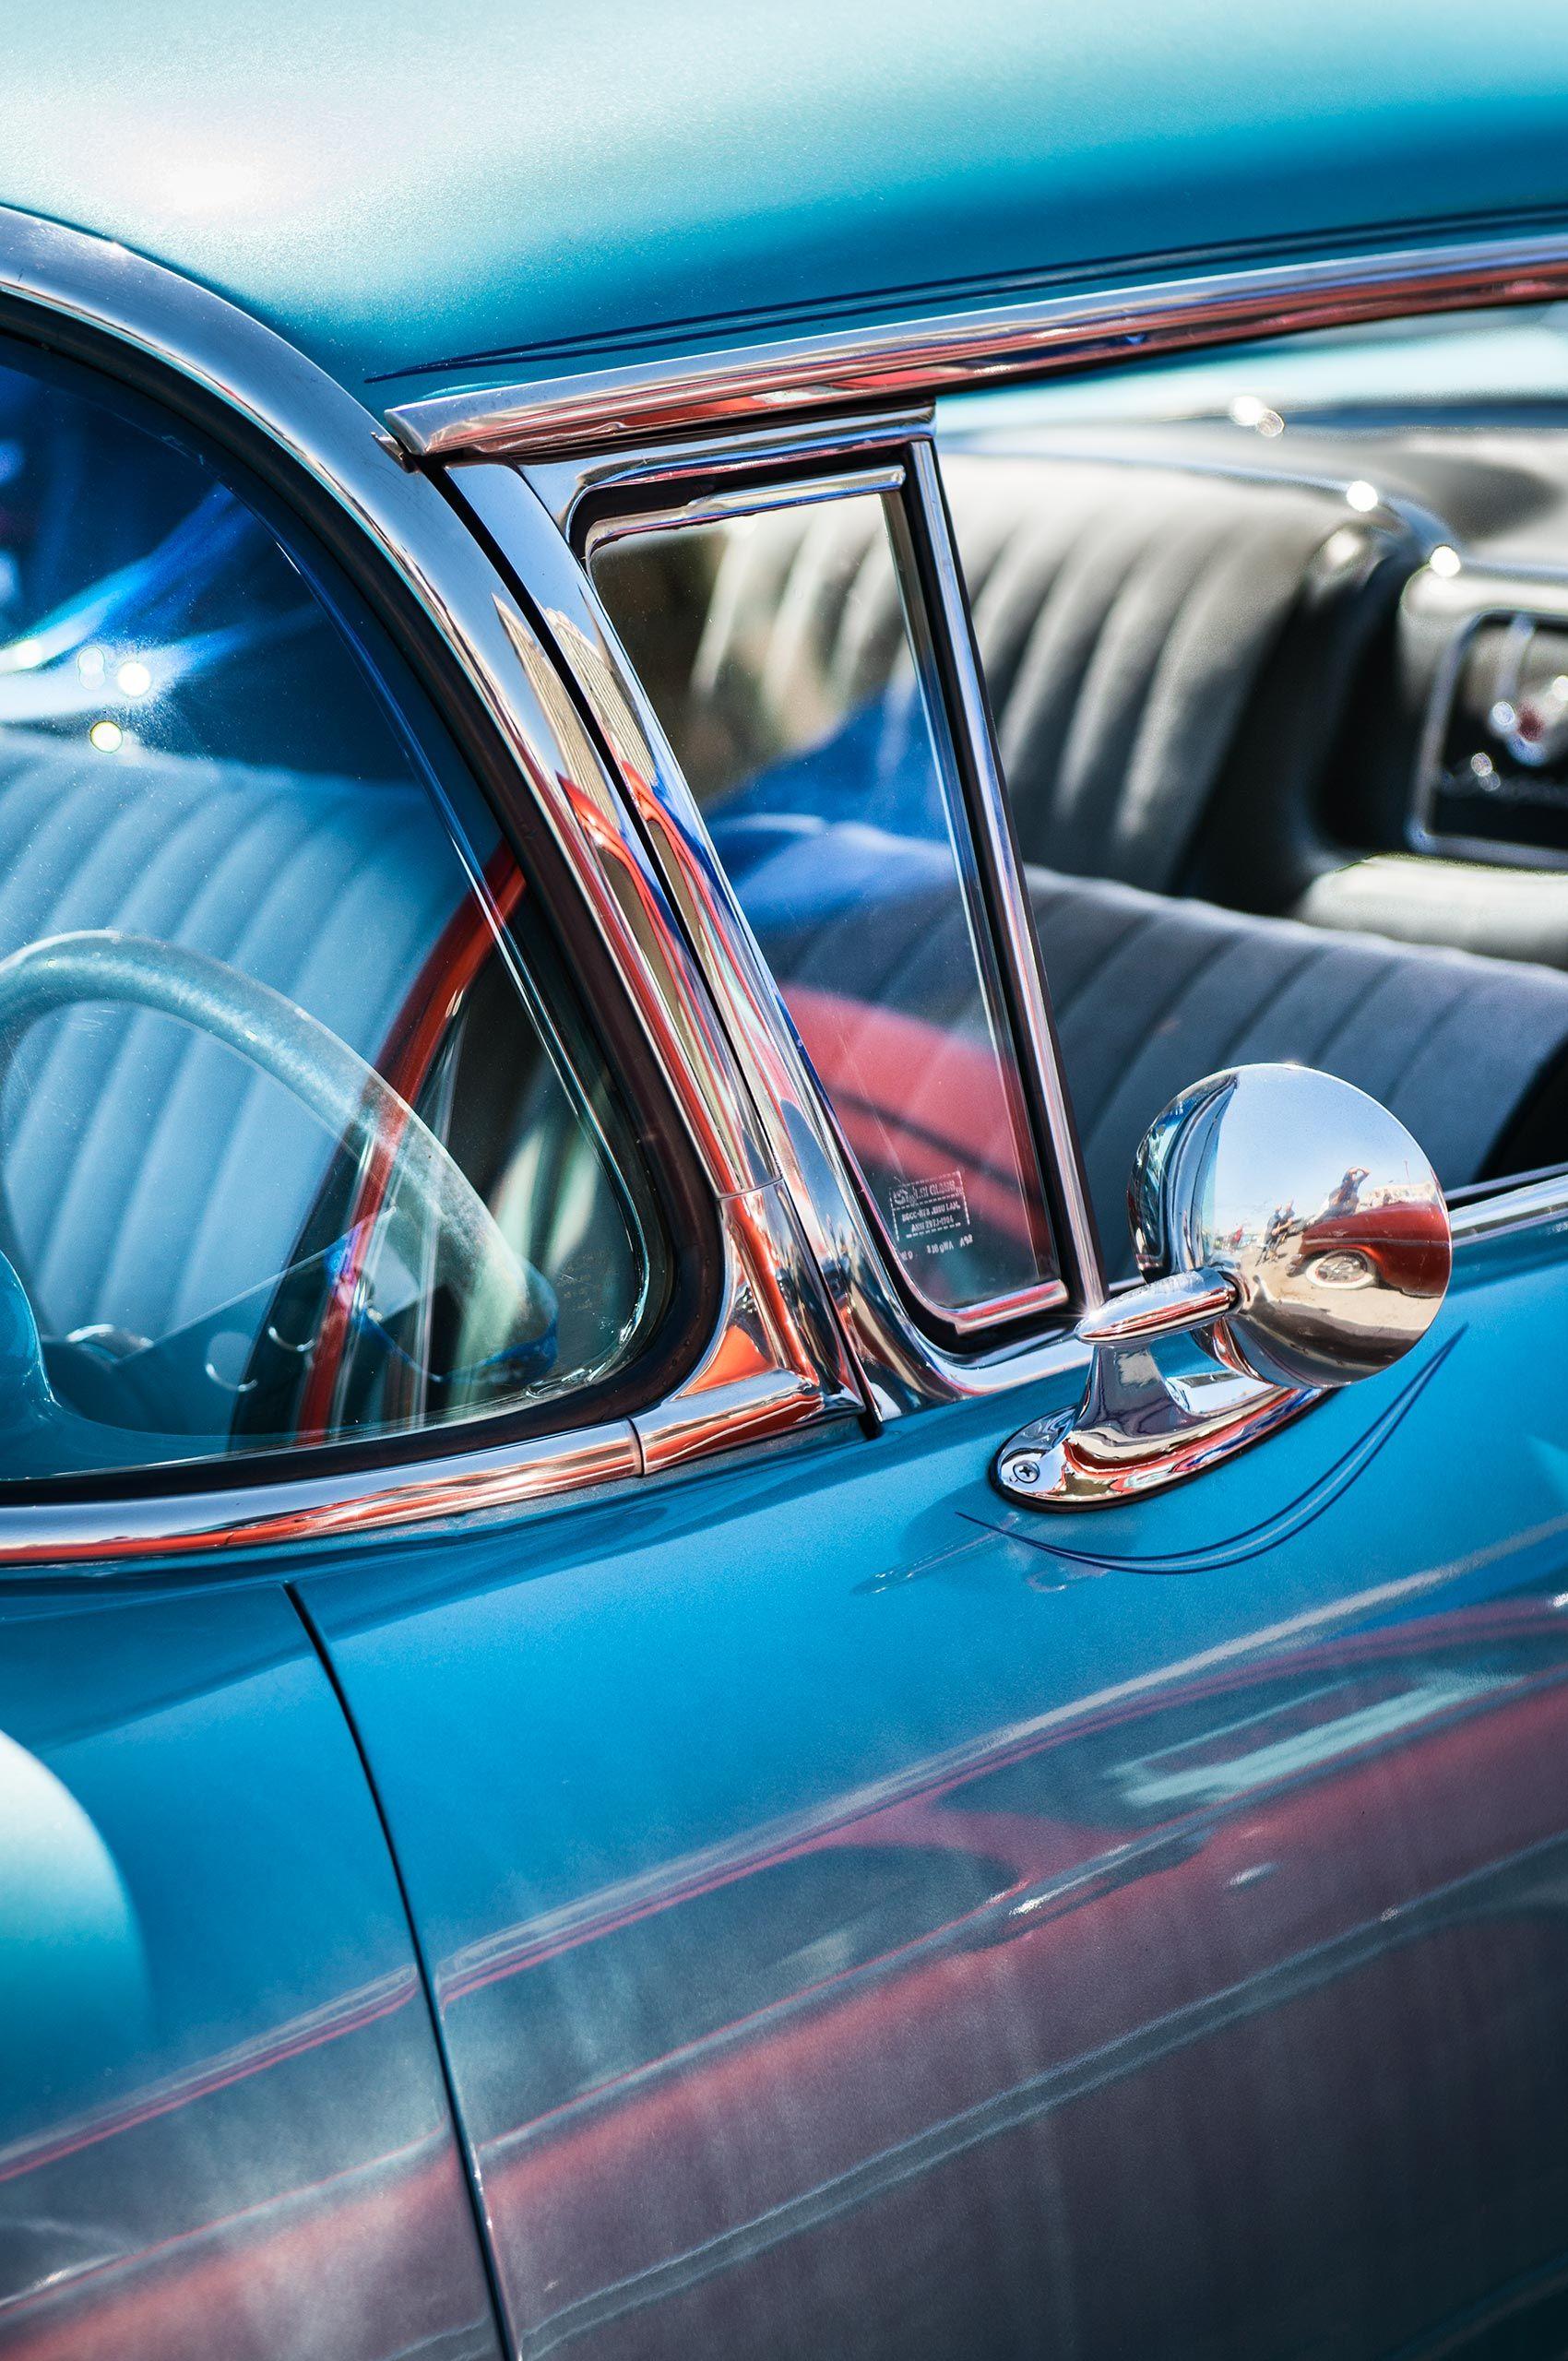 classic-blue-green-car-detail-vivalasvegas-HenrikOlundPhotography.jpg